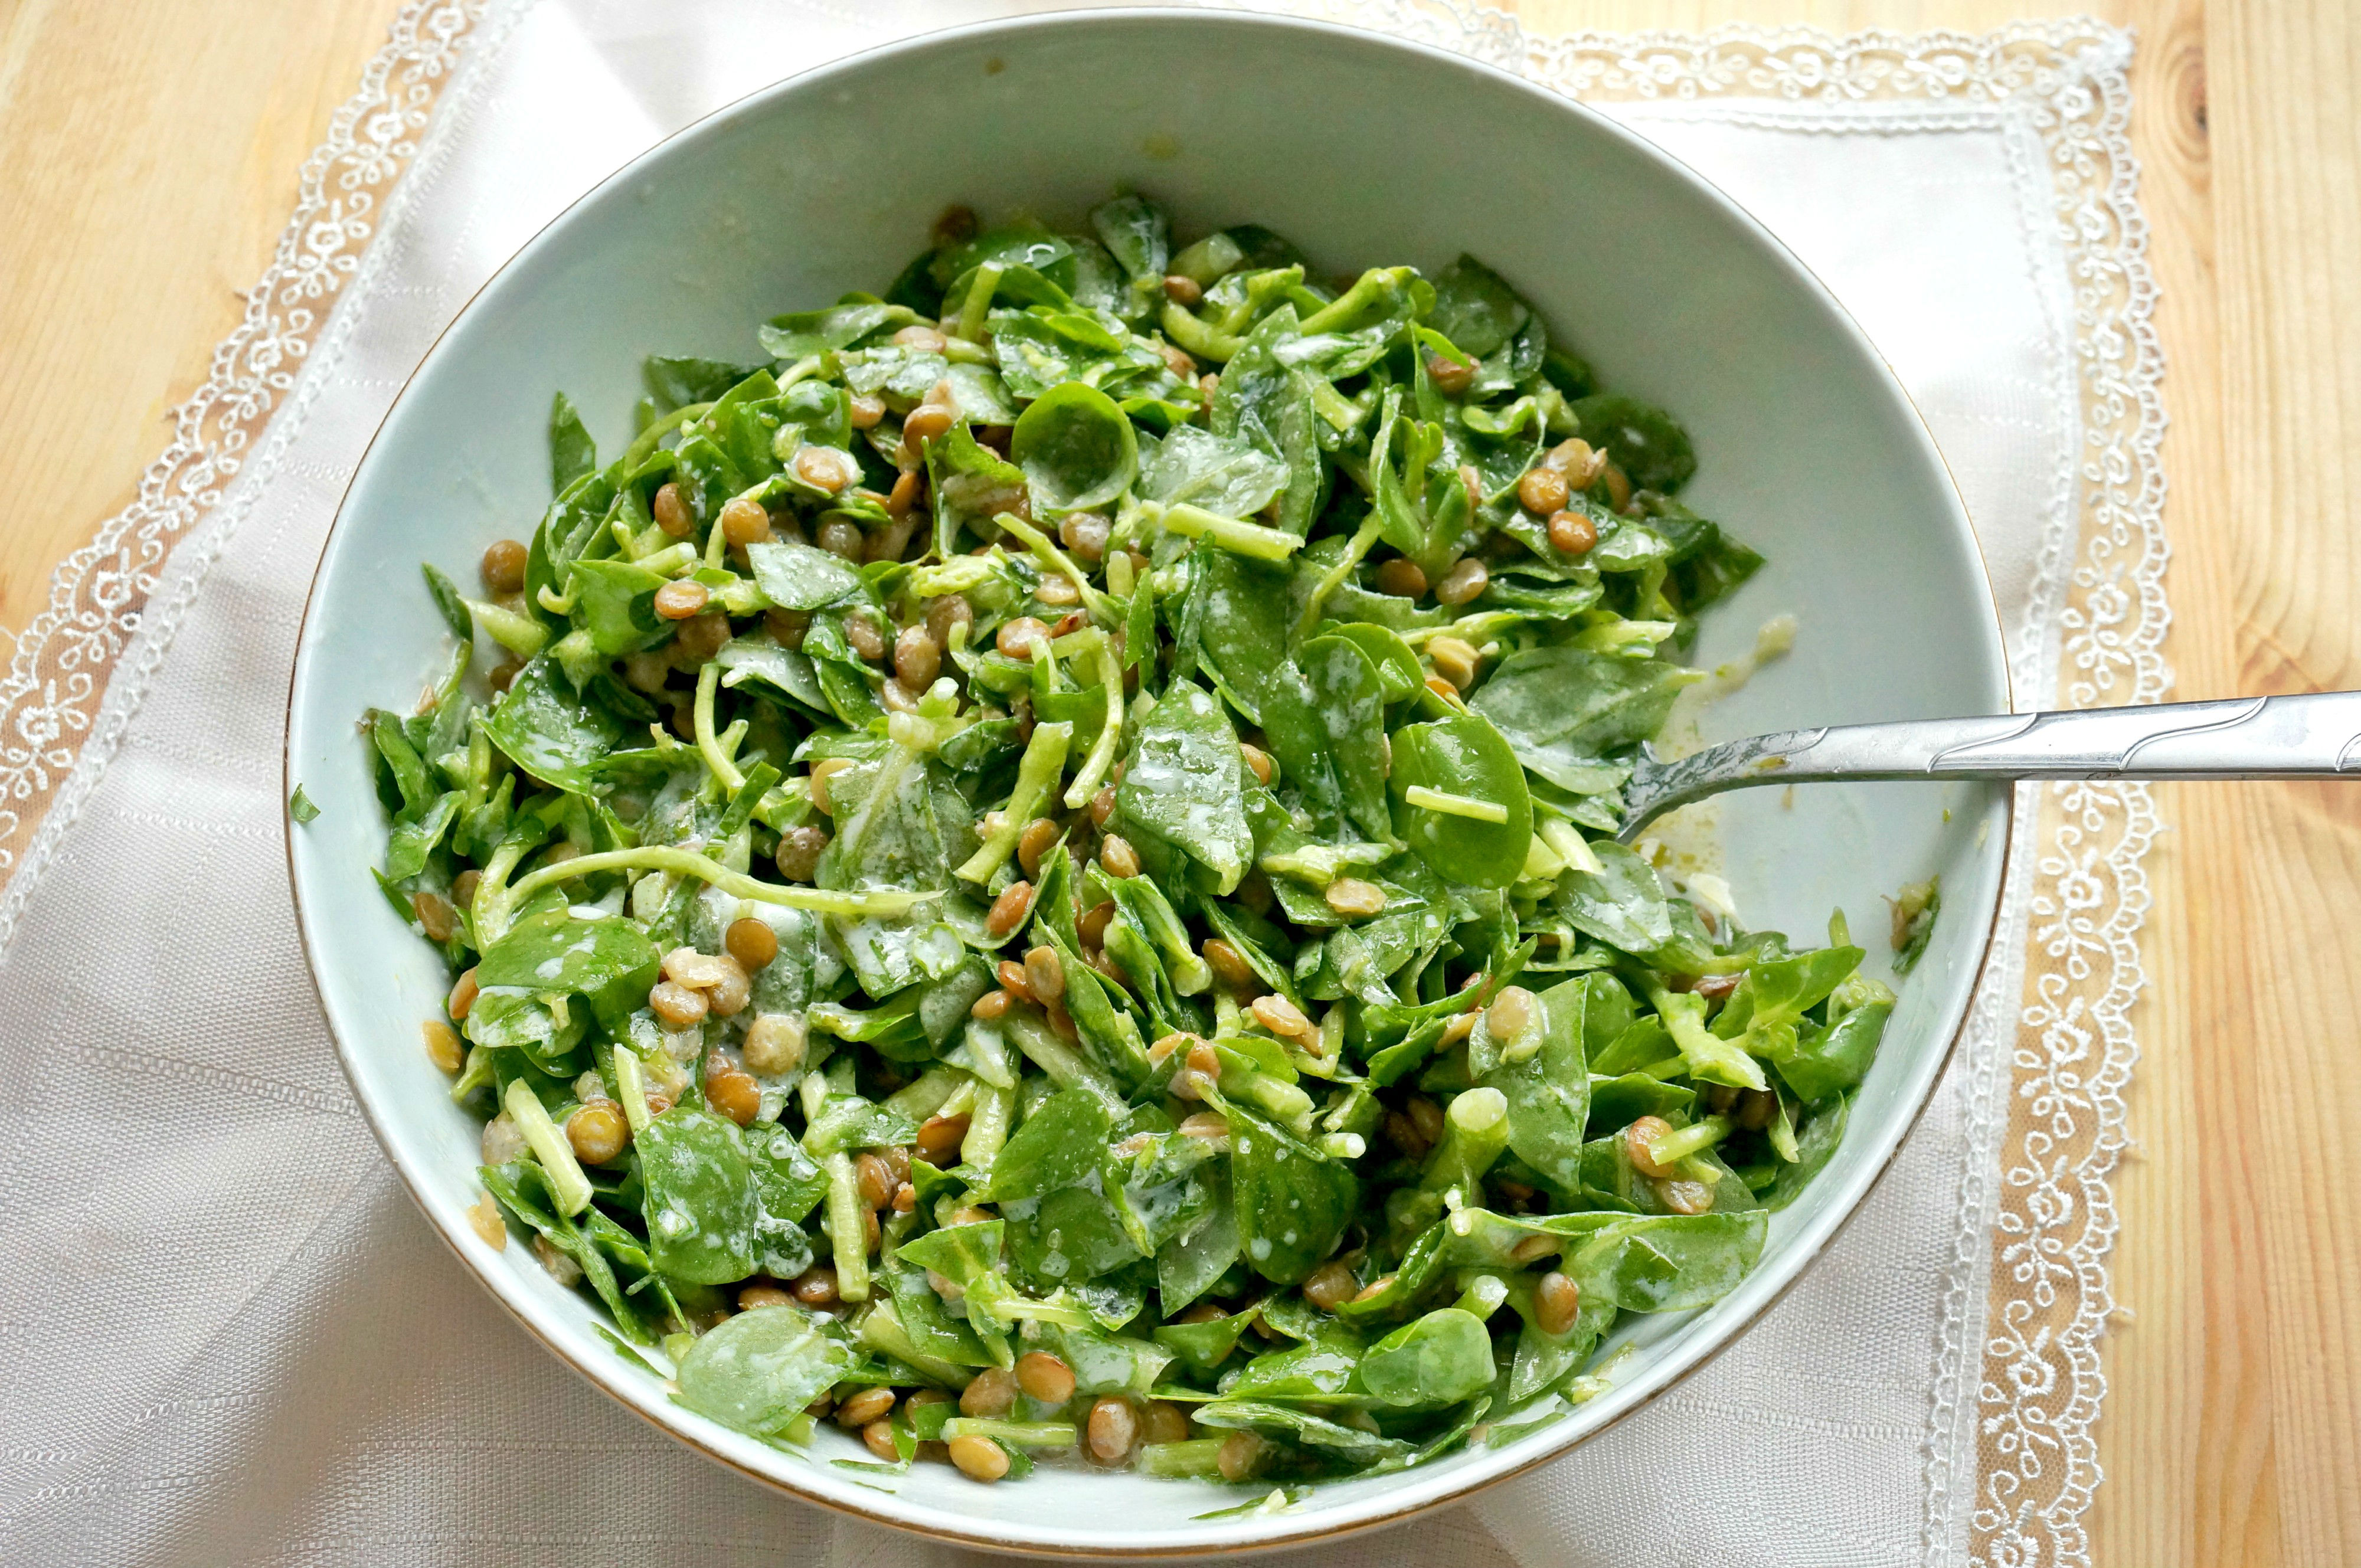 https://yemek.com/tarif/mercimekli-semizotu-salatasi/   Mercimekli Semizotu Salatası Tarifi